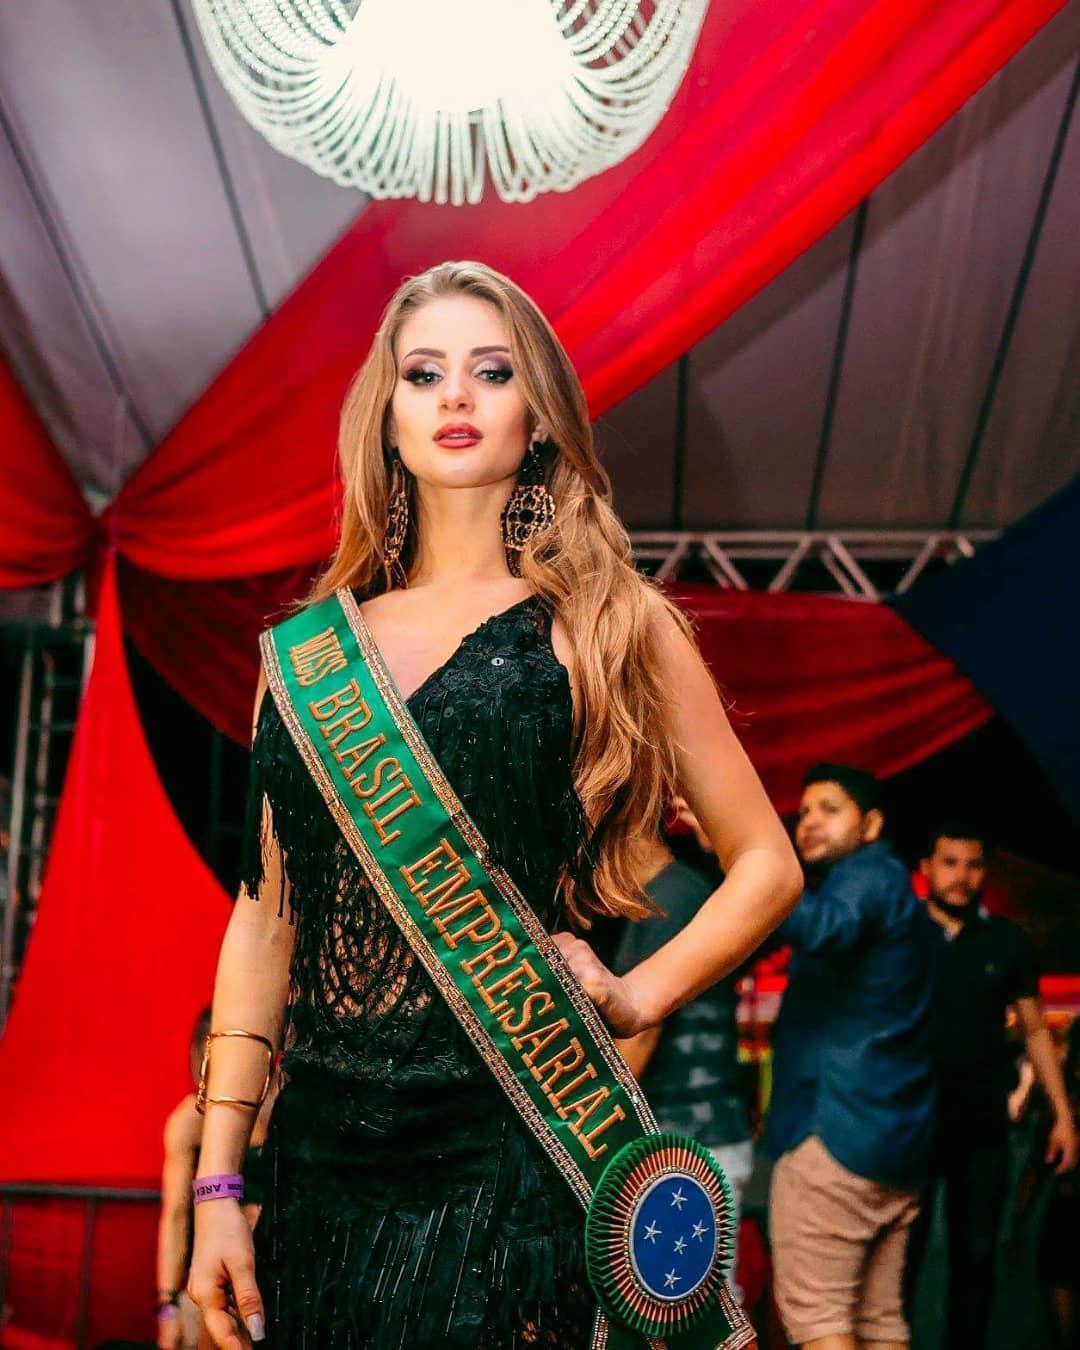 gabriela palma, miss brasil empresarial 2018. - Página 6 39196213